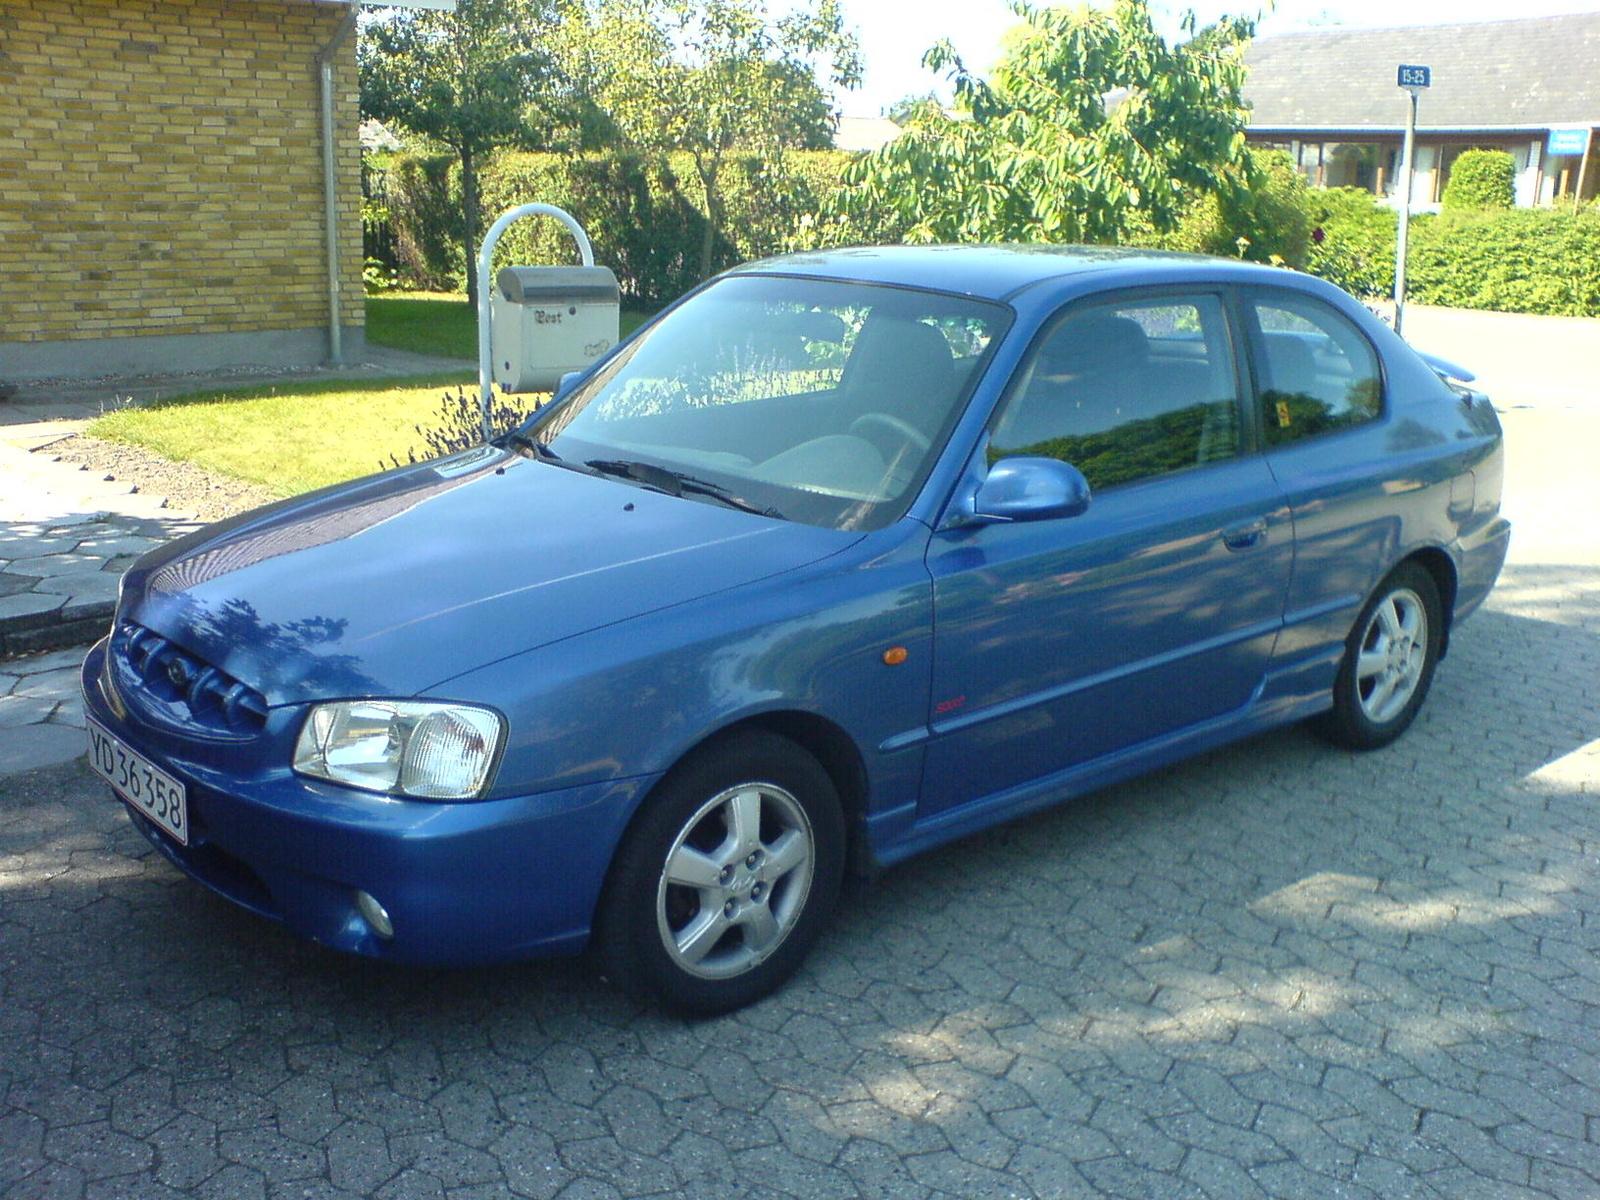 2001 Hyundai Elantra Overview Cargurus Autos Post